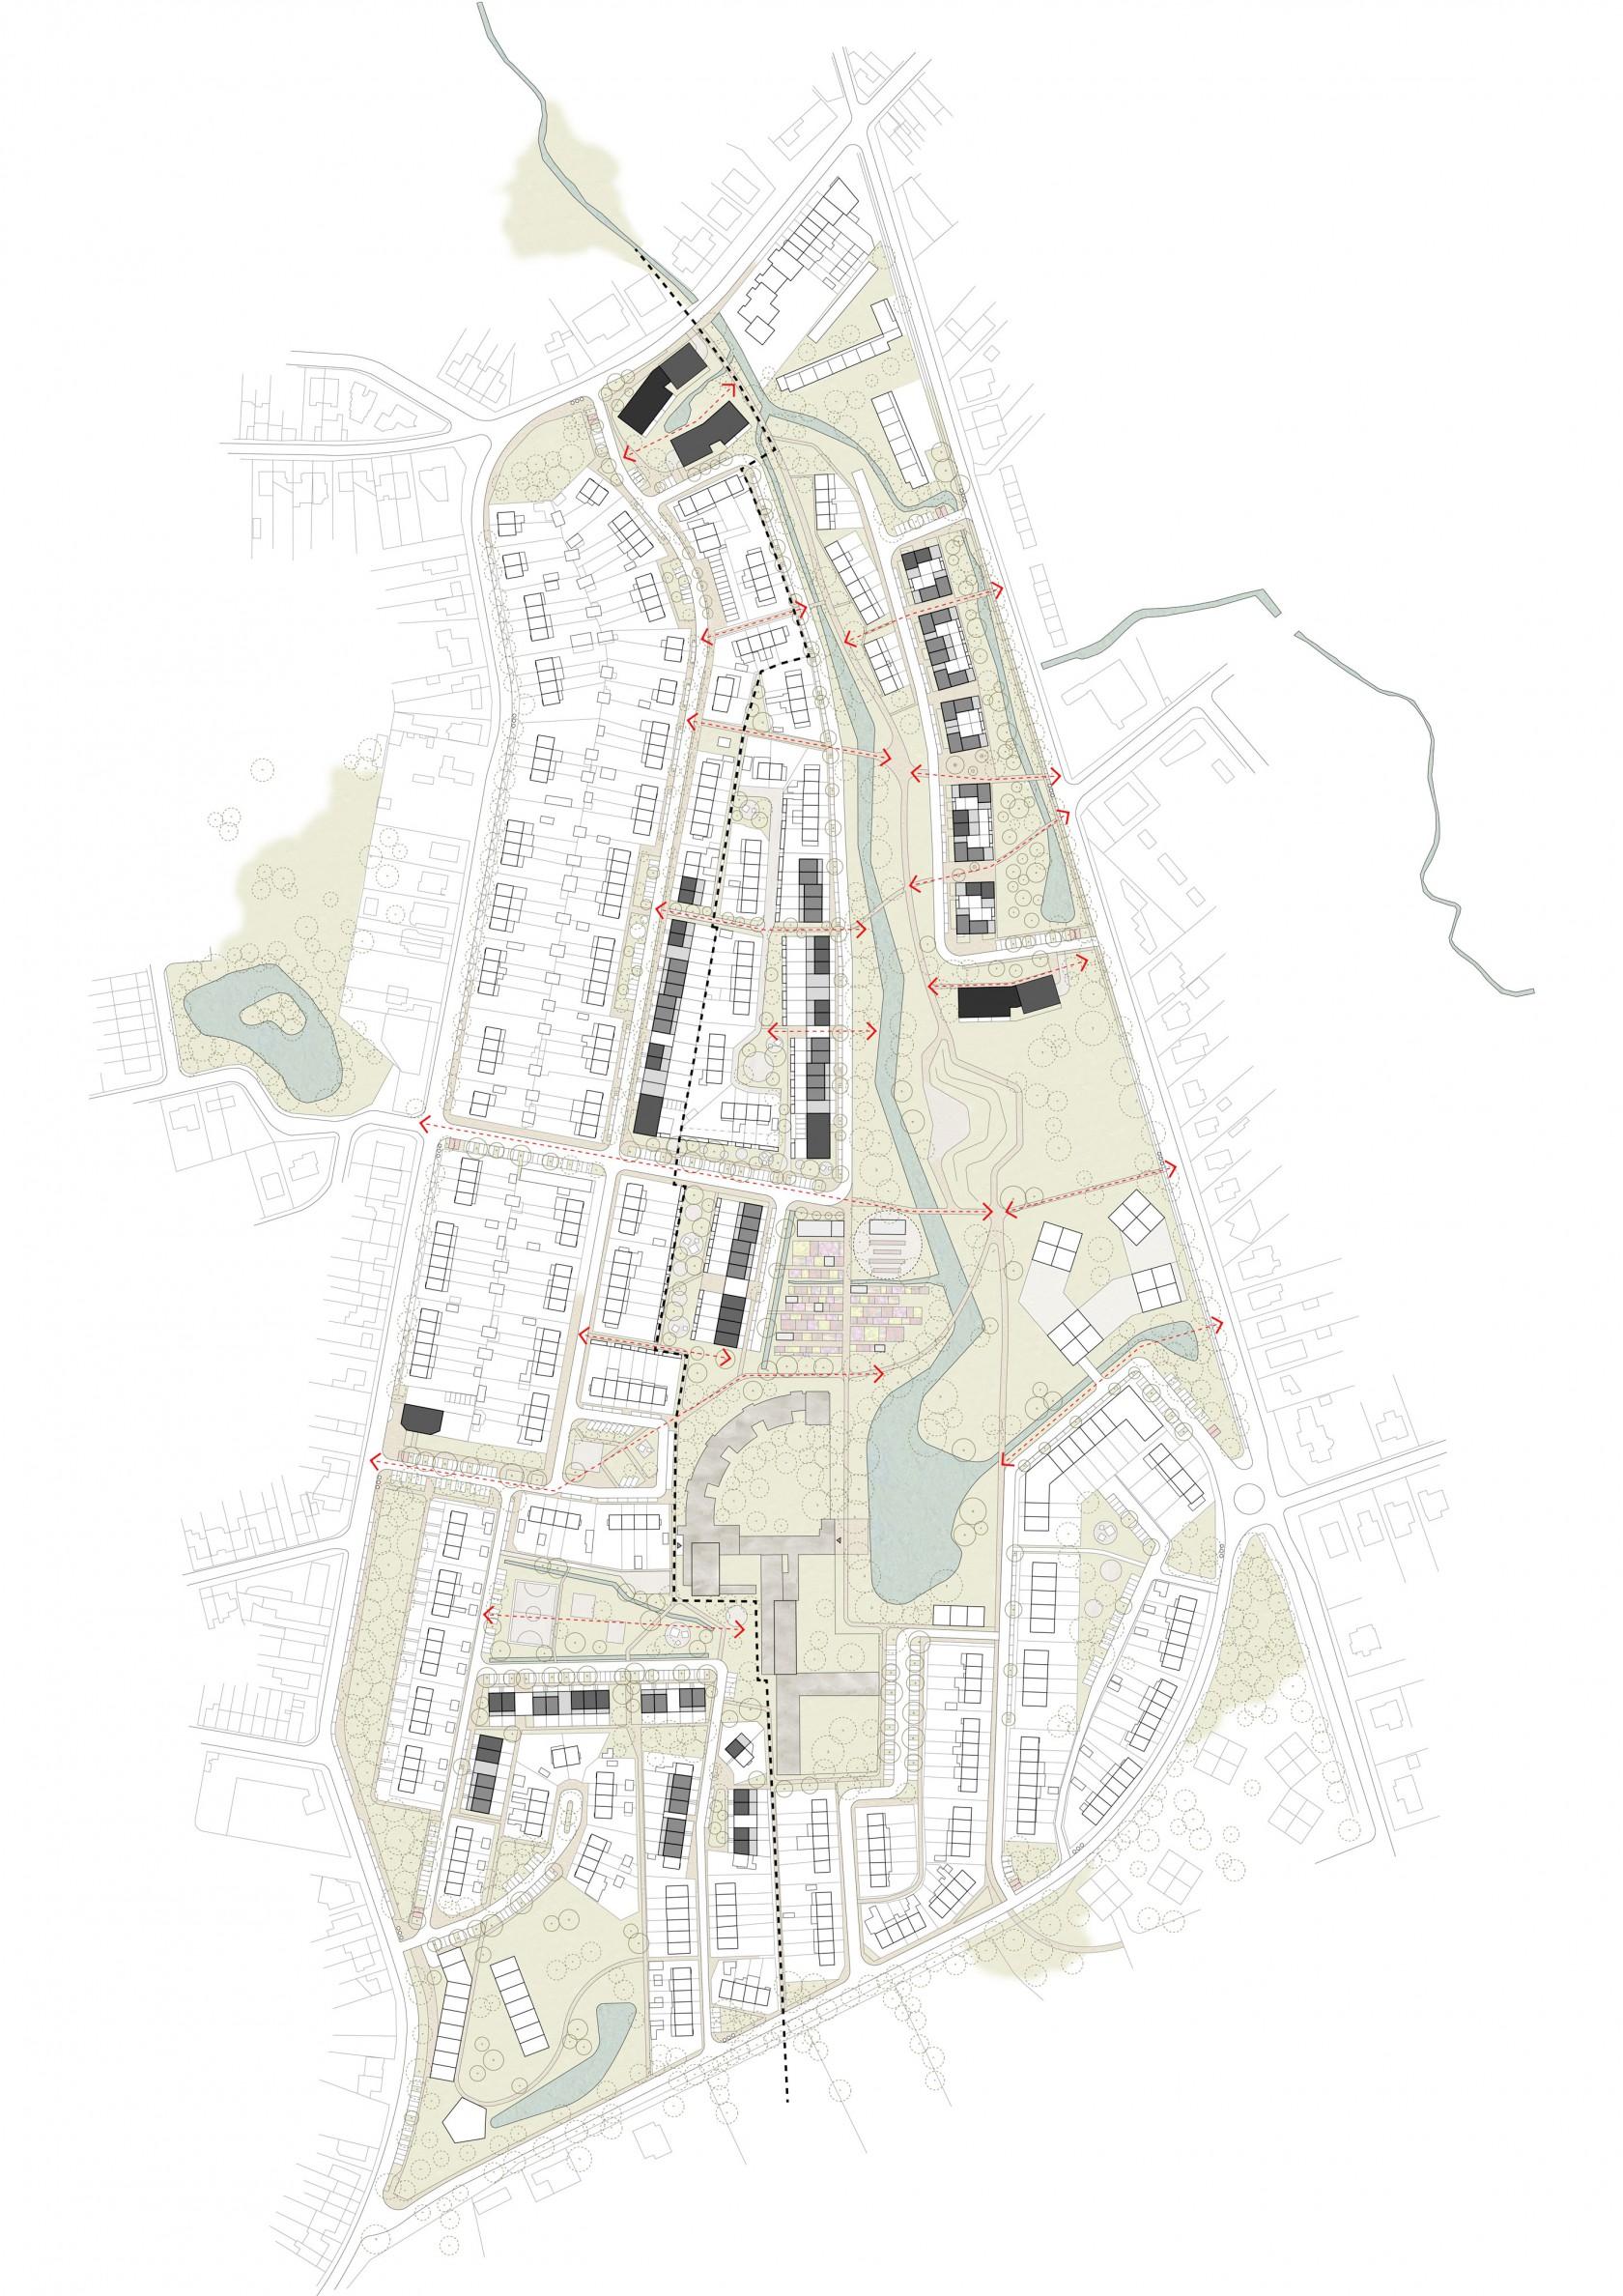 Abscis Architecten - overzichtsplan